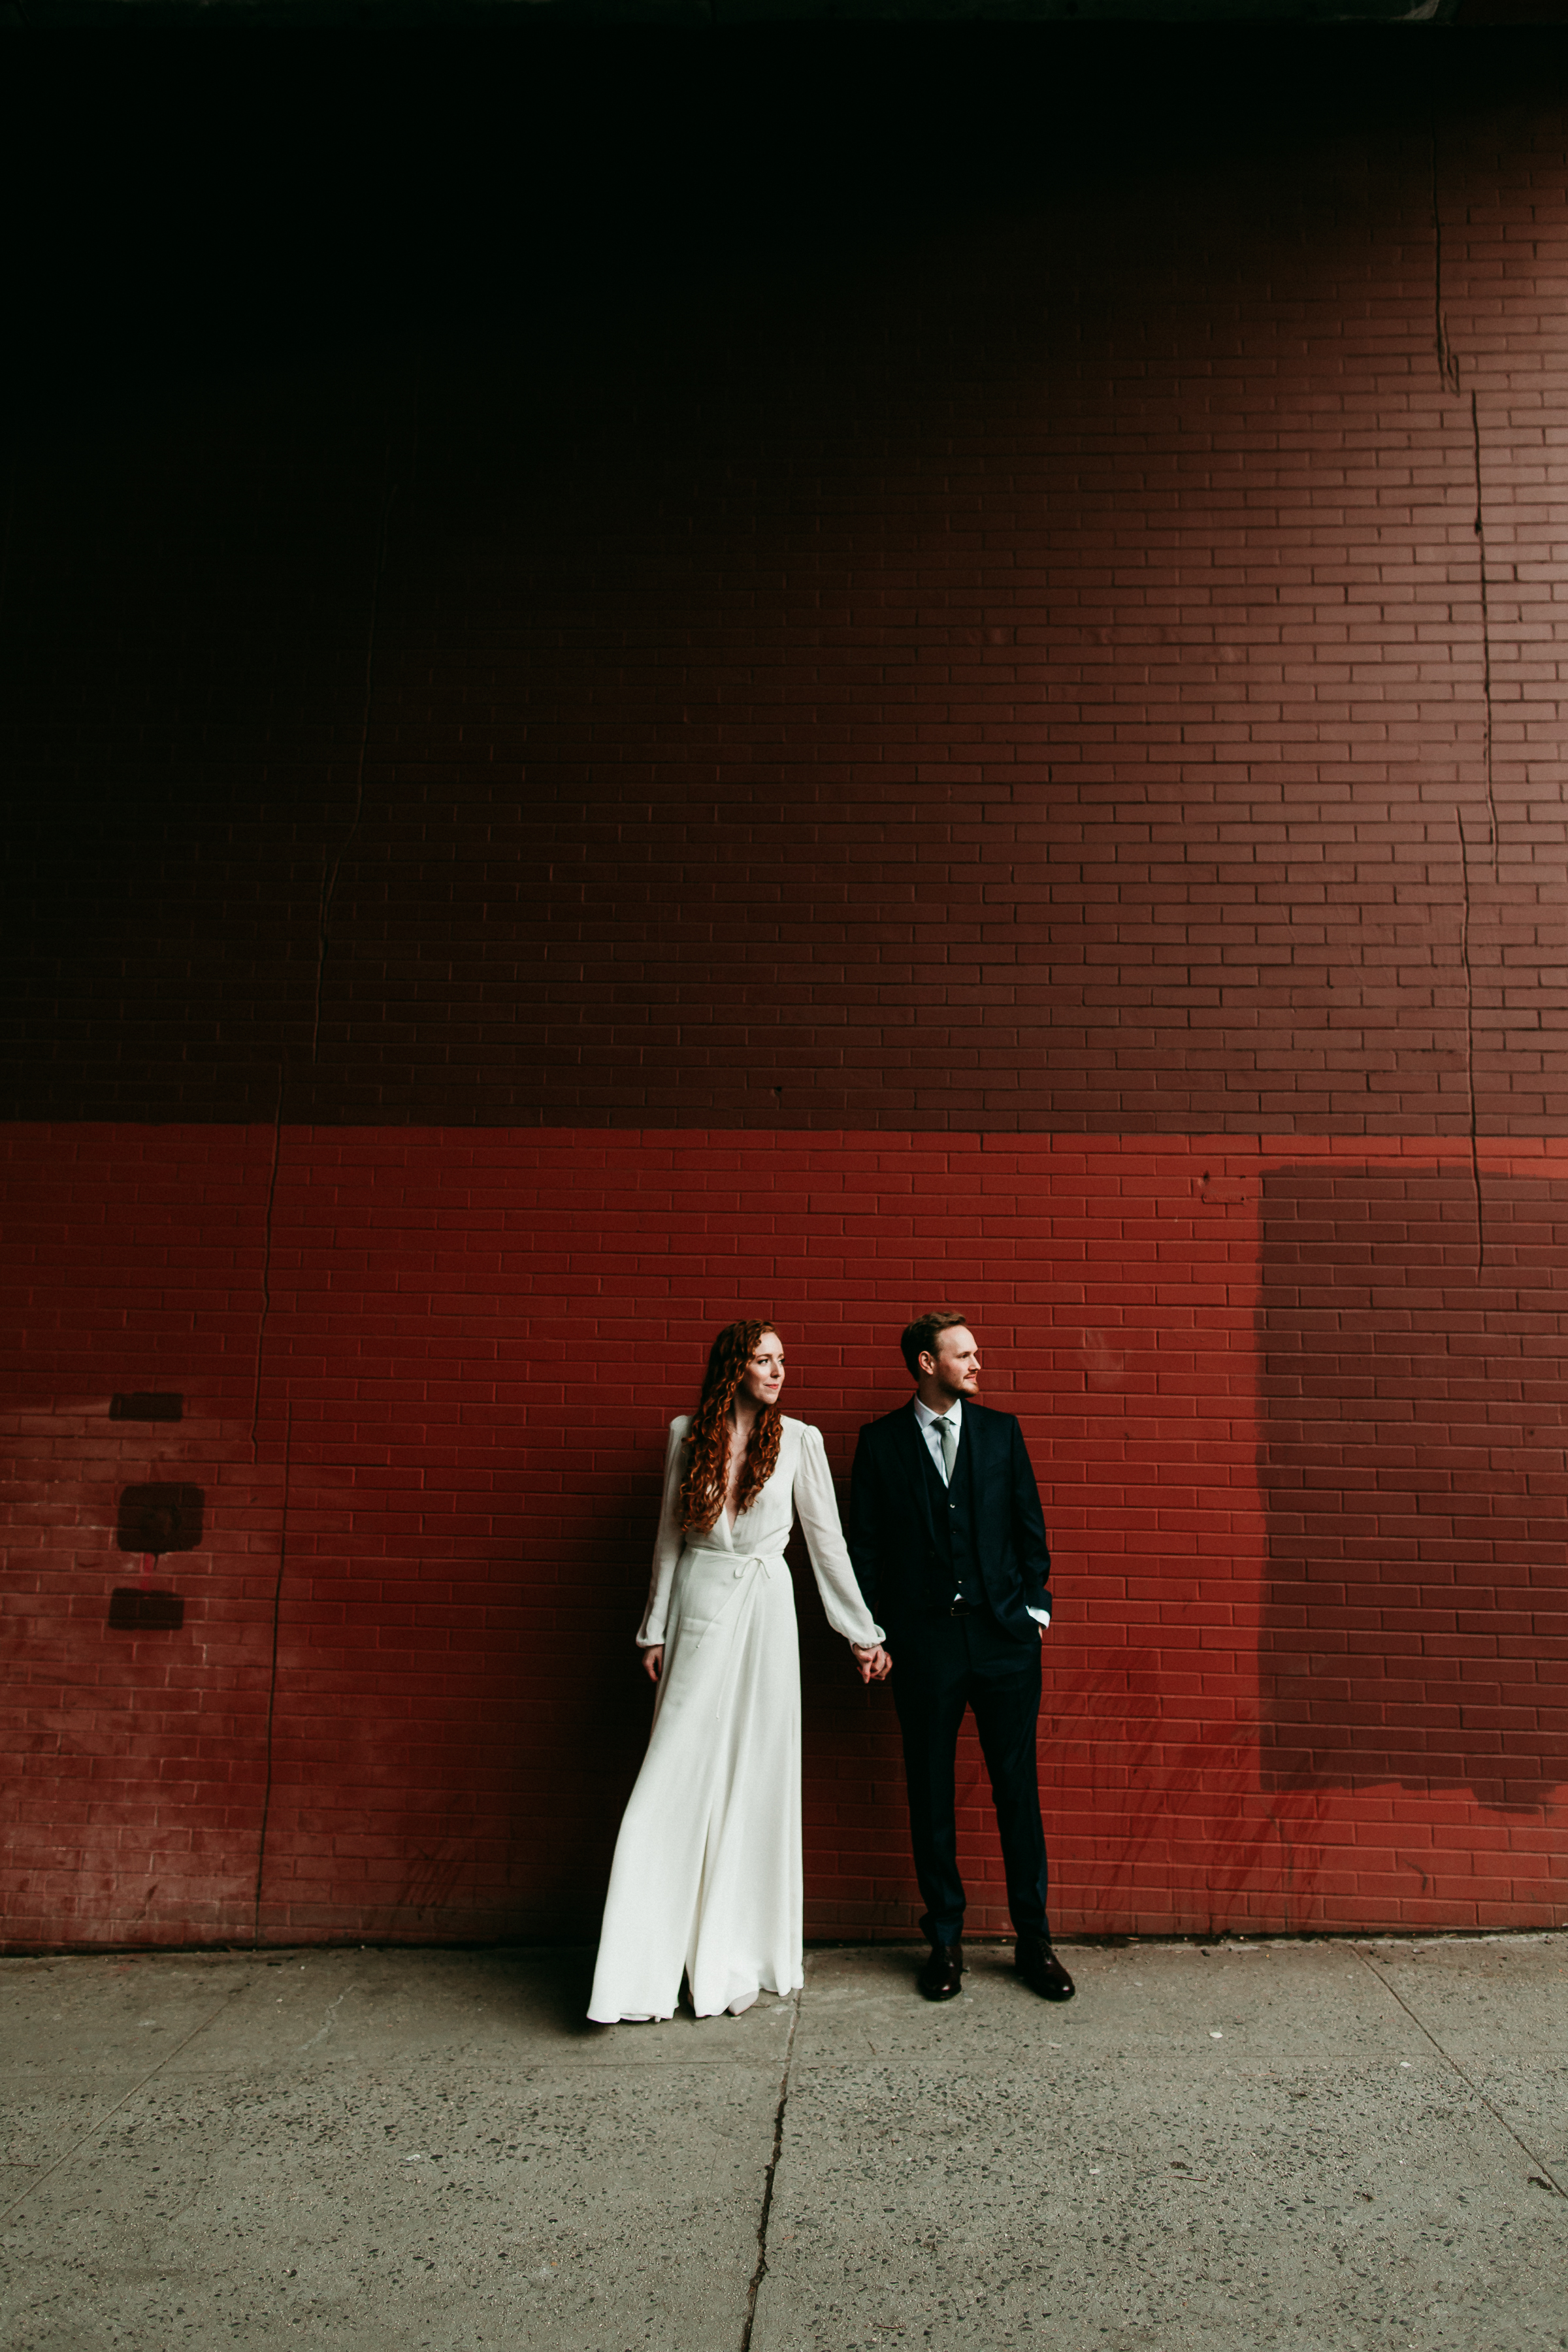 Freemans-Restaurant-Soho-Brooklyn-Bridge-Park-Dumbo-Documentary-Wedding-Photographer-4.jpg